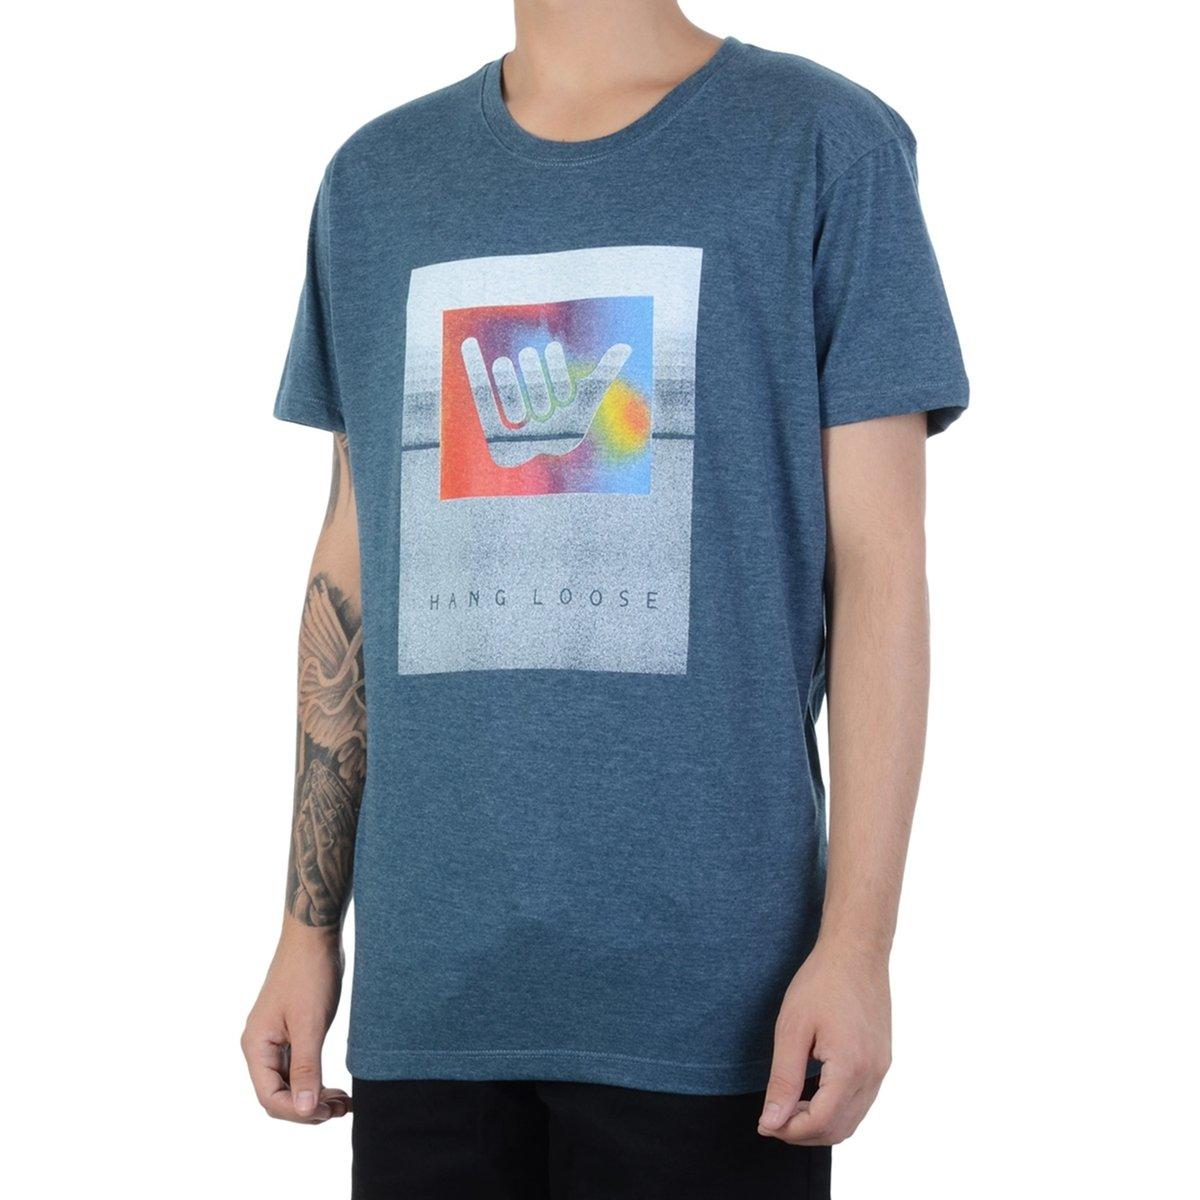 Camiseta Hang Loose Shakabow  Camiseta Hang Loose Shakabow ... afc9c5ae11475